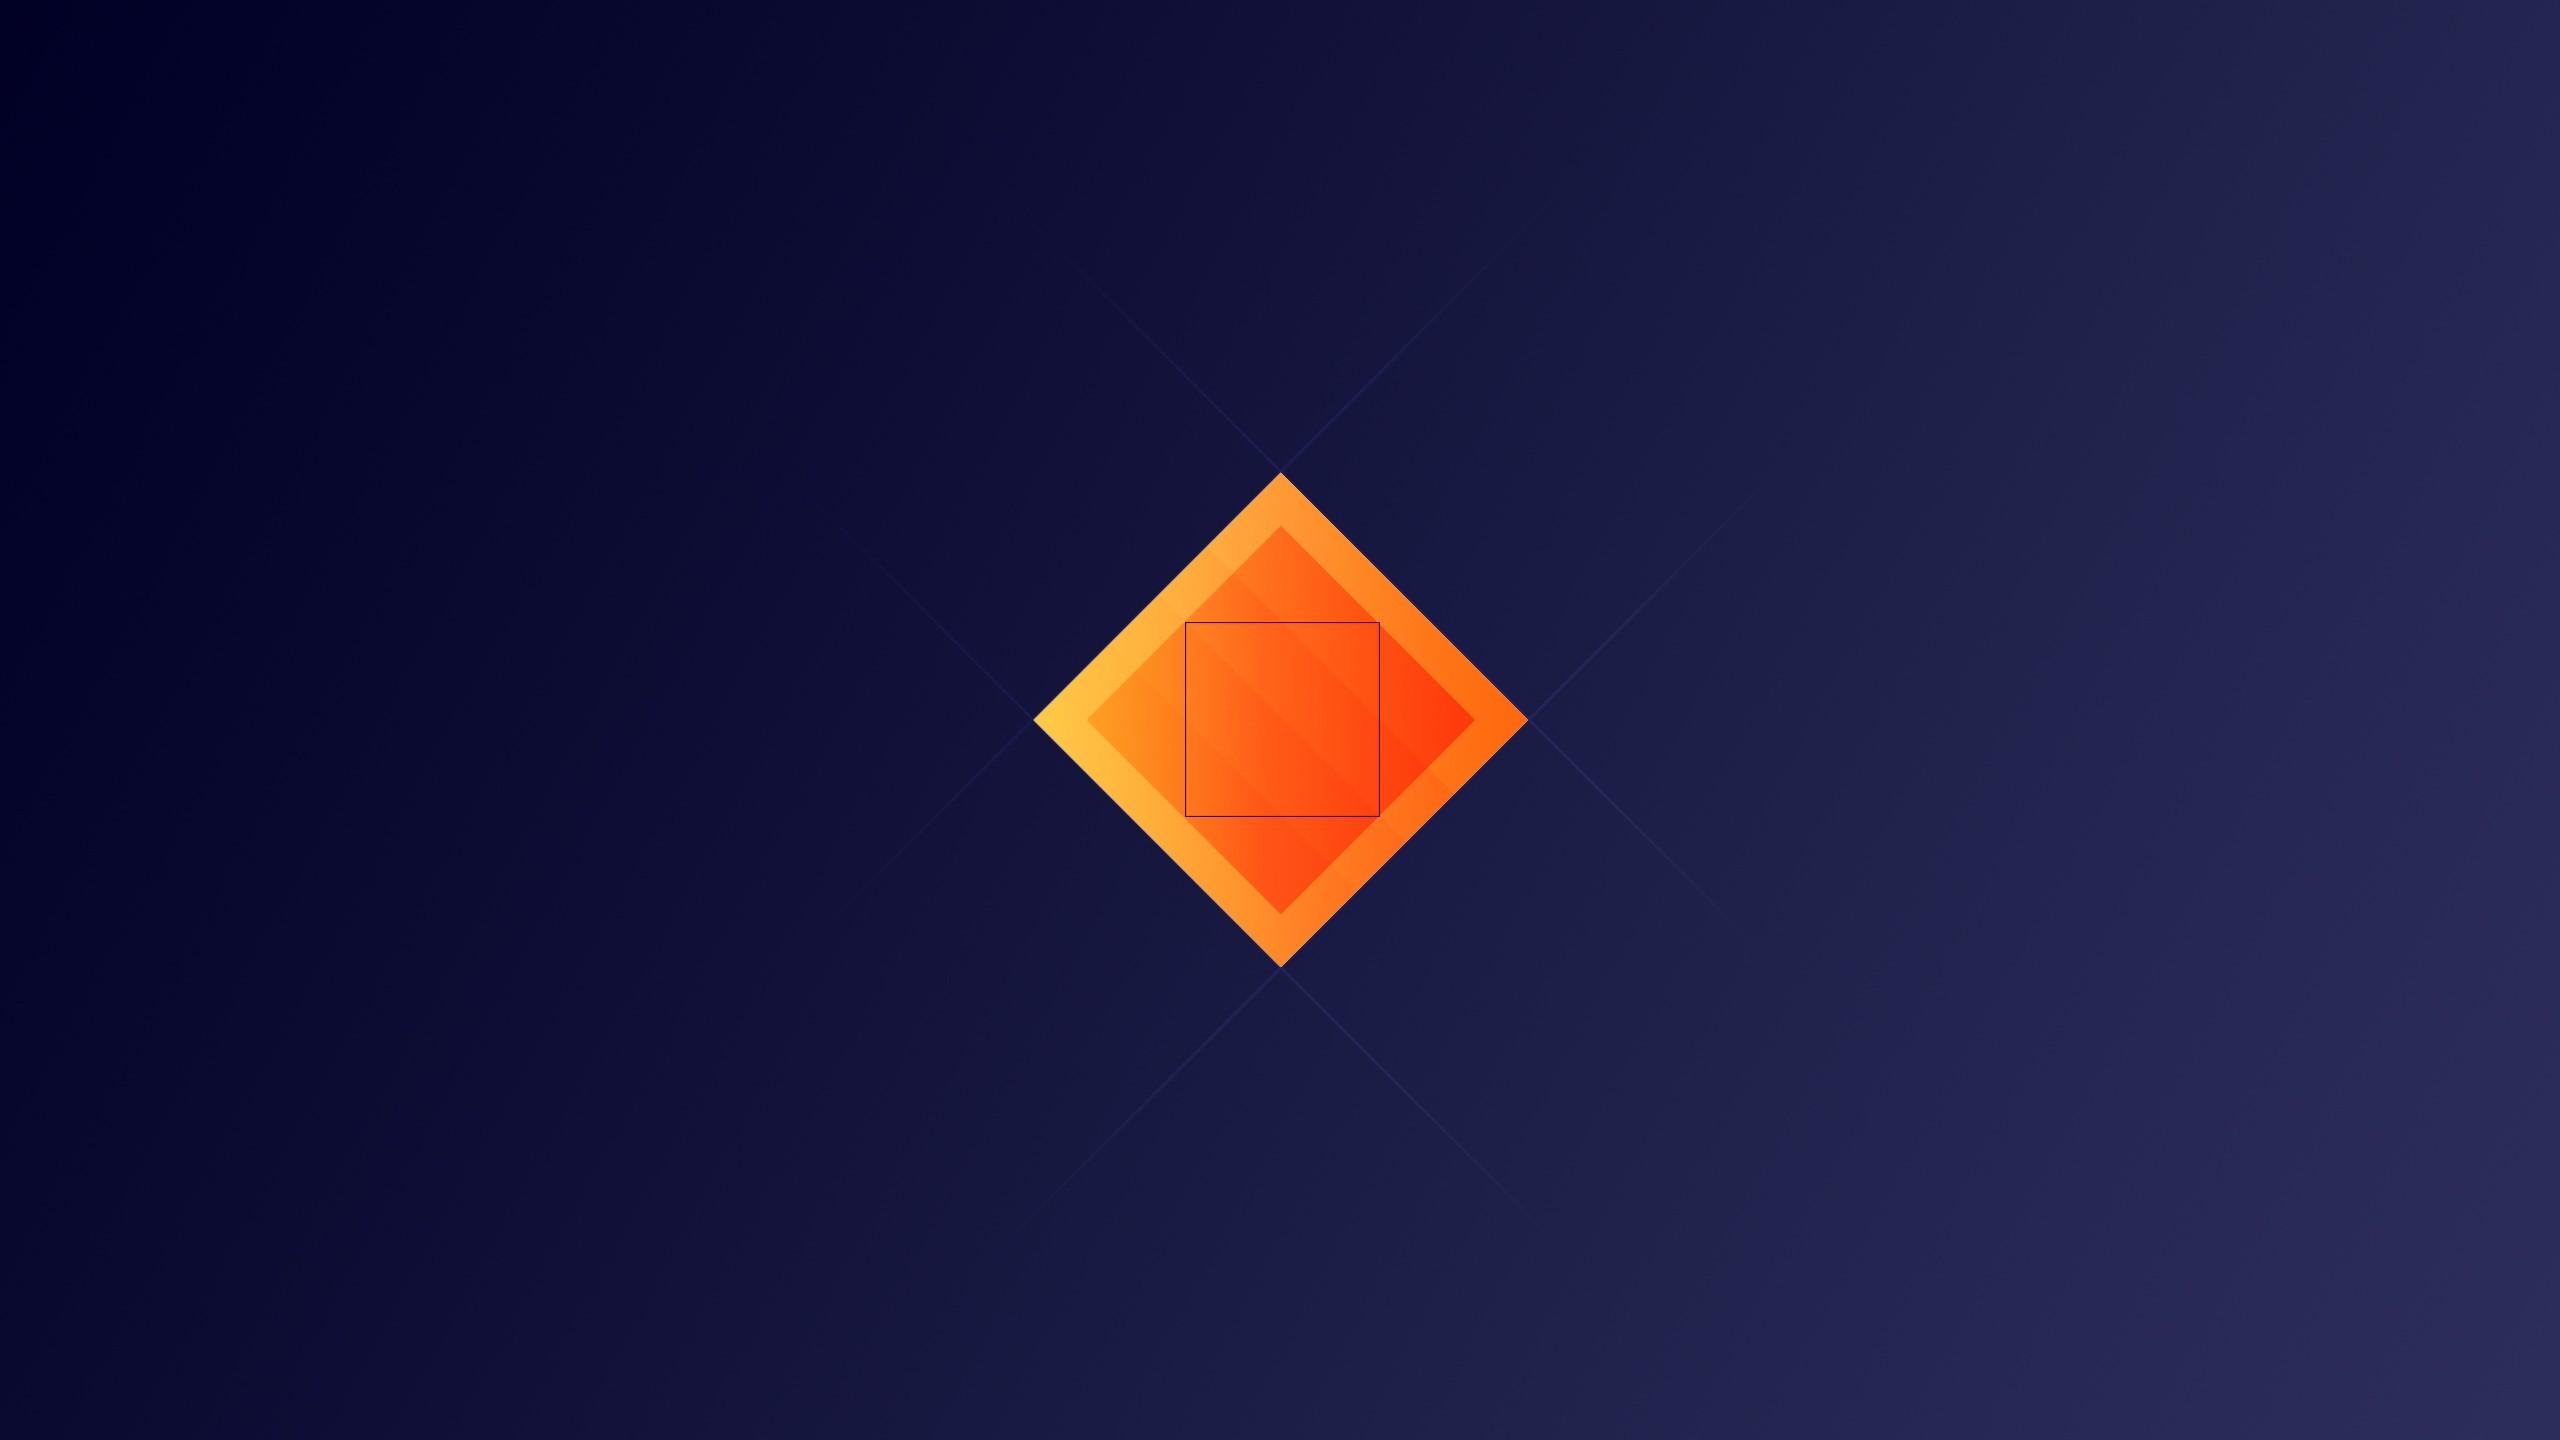 1152x864 Minimalsim Simple Background 1152x864 Resolution